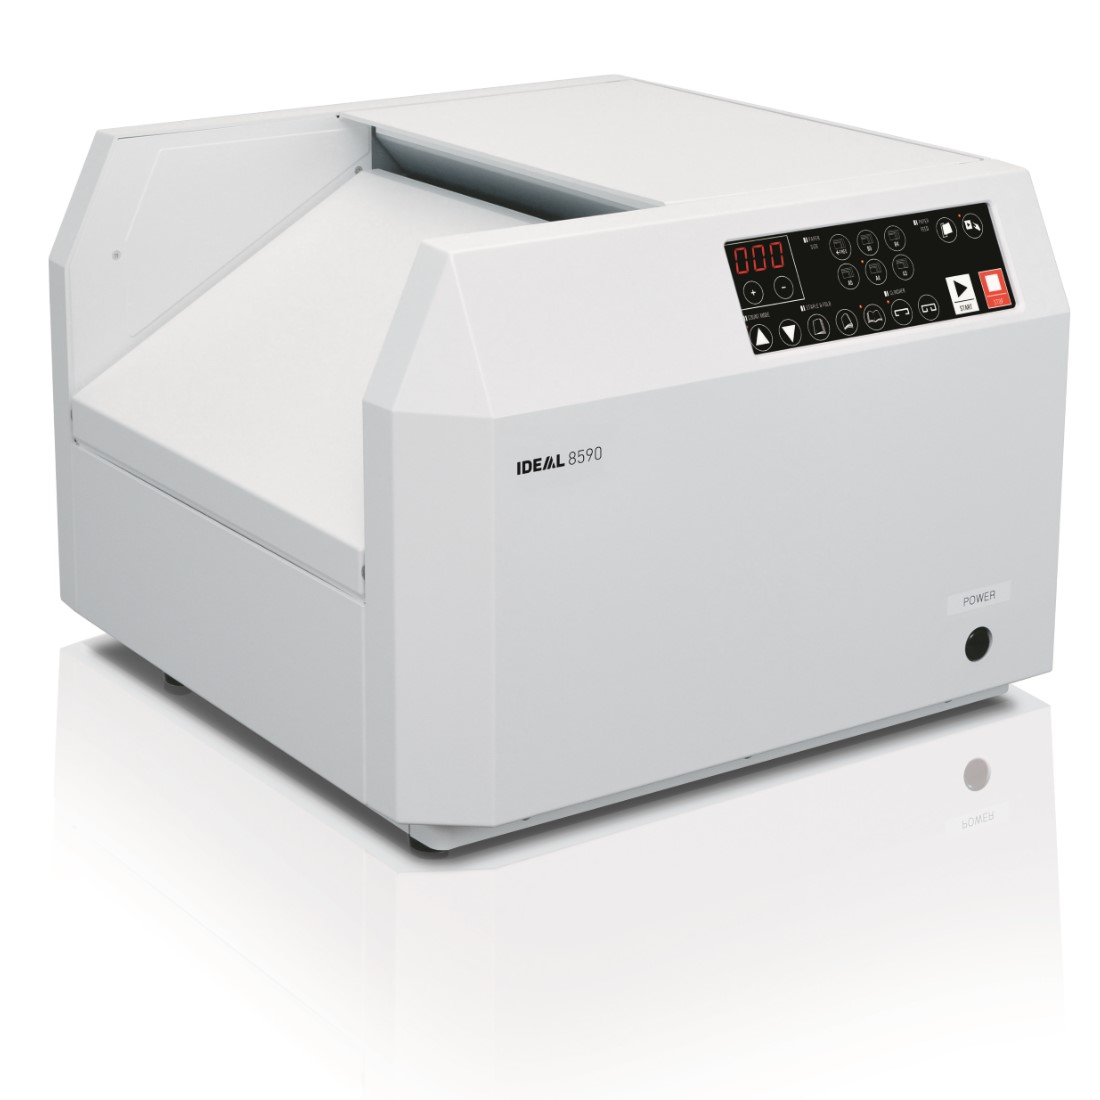 Brožurovací stroj - IDEAL 8590